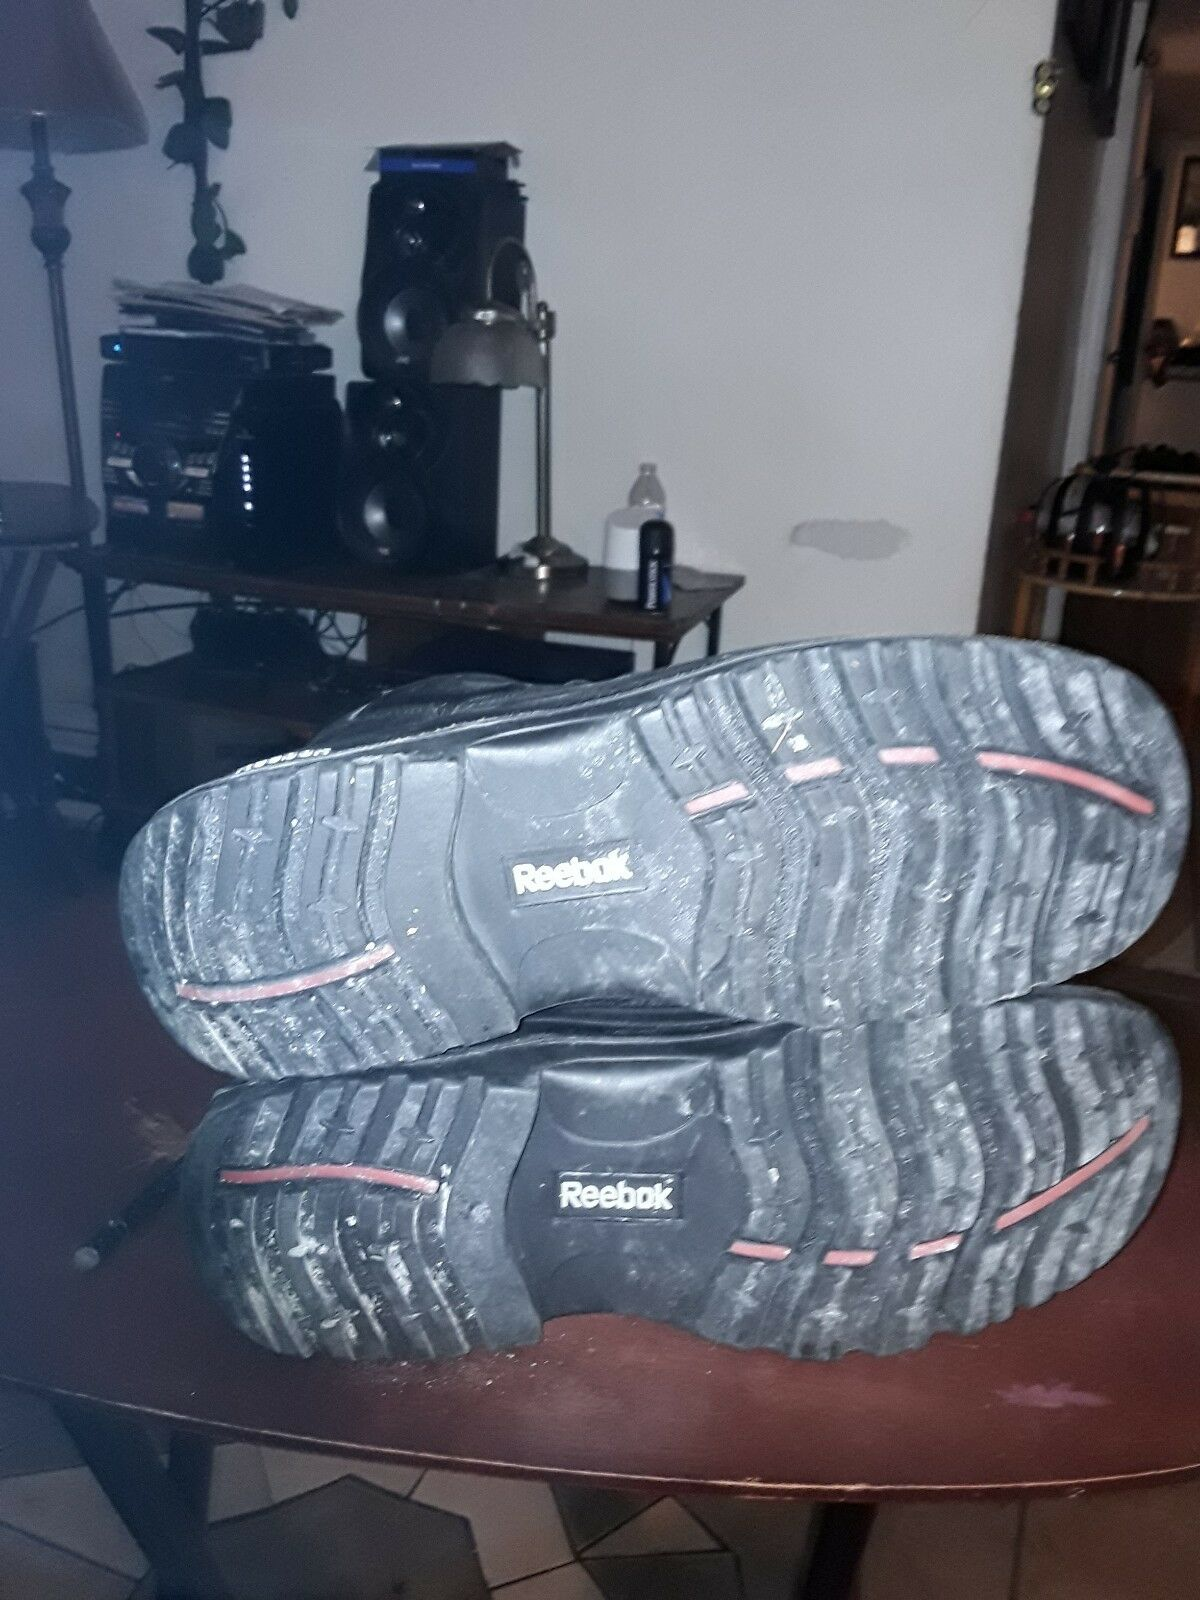 Mens Reebok Steel toe Work stivali Dimensione 12 W W W protective footwear, worn once e07ec2